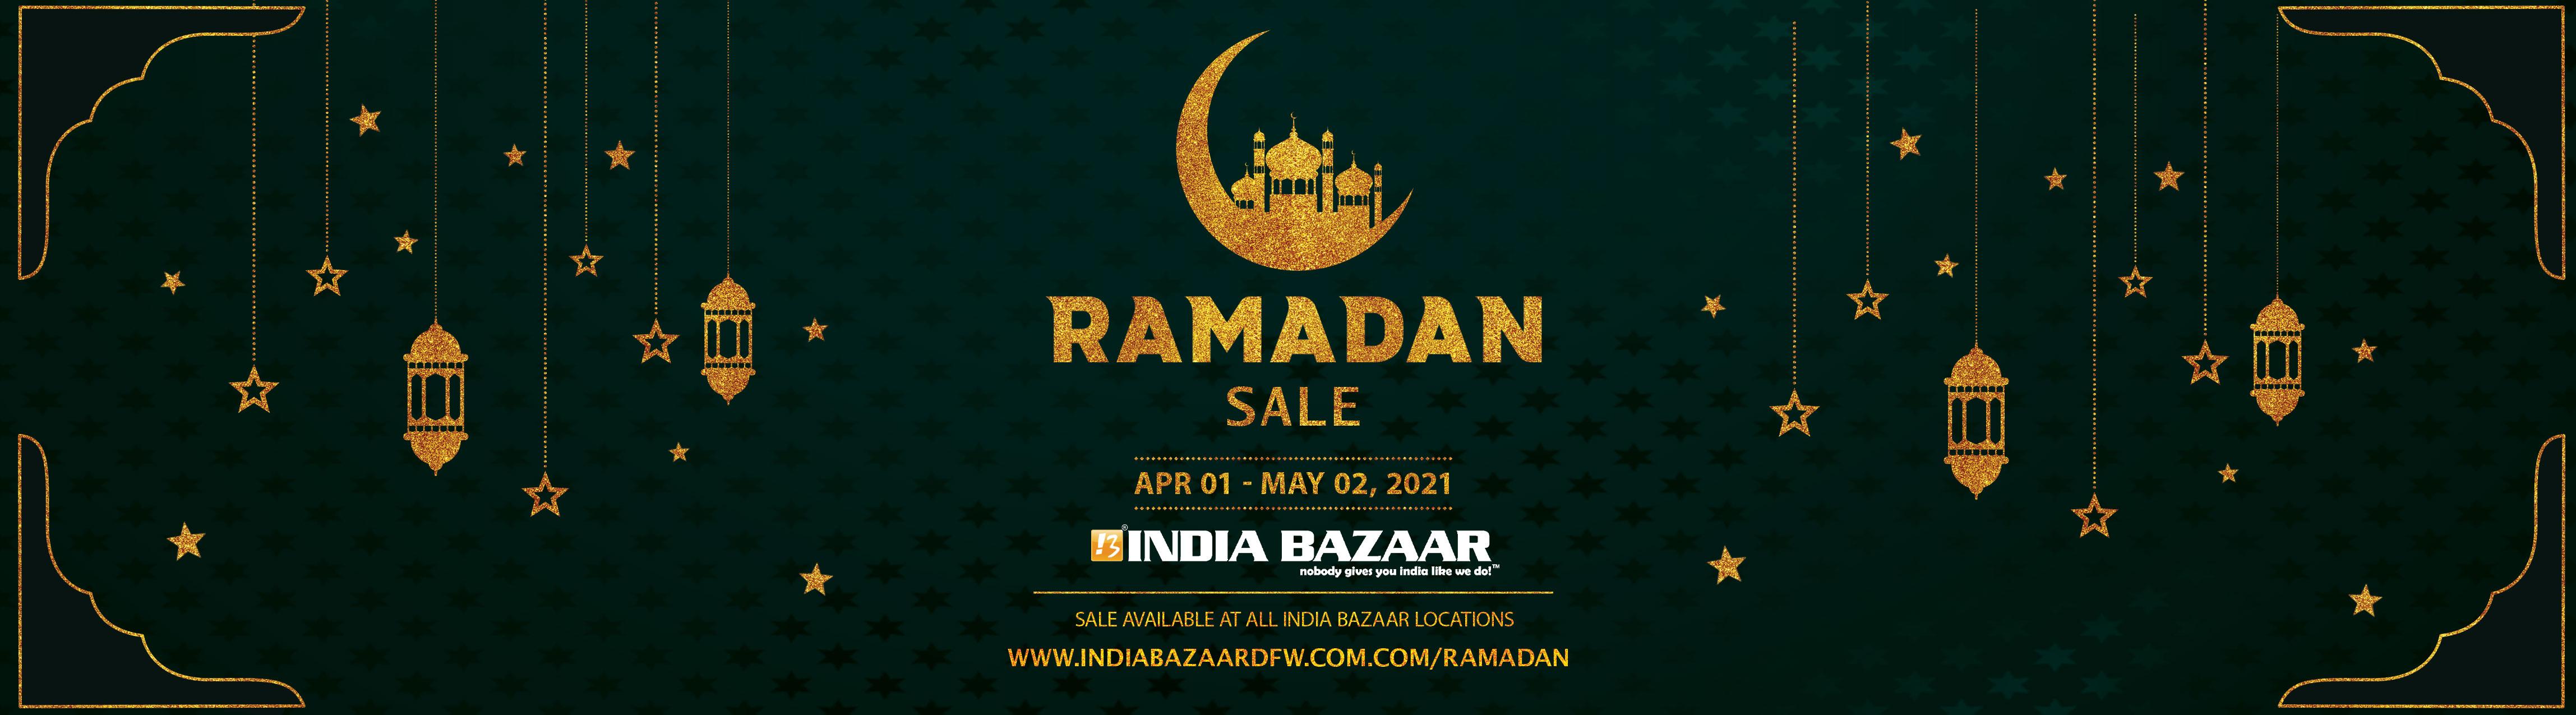 Ramadan-Flyer-cover-web